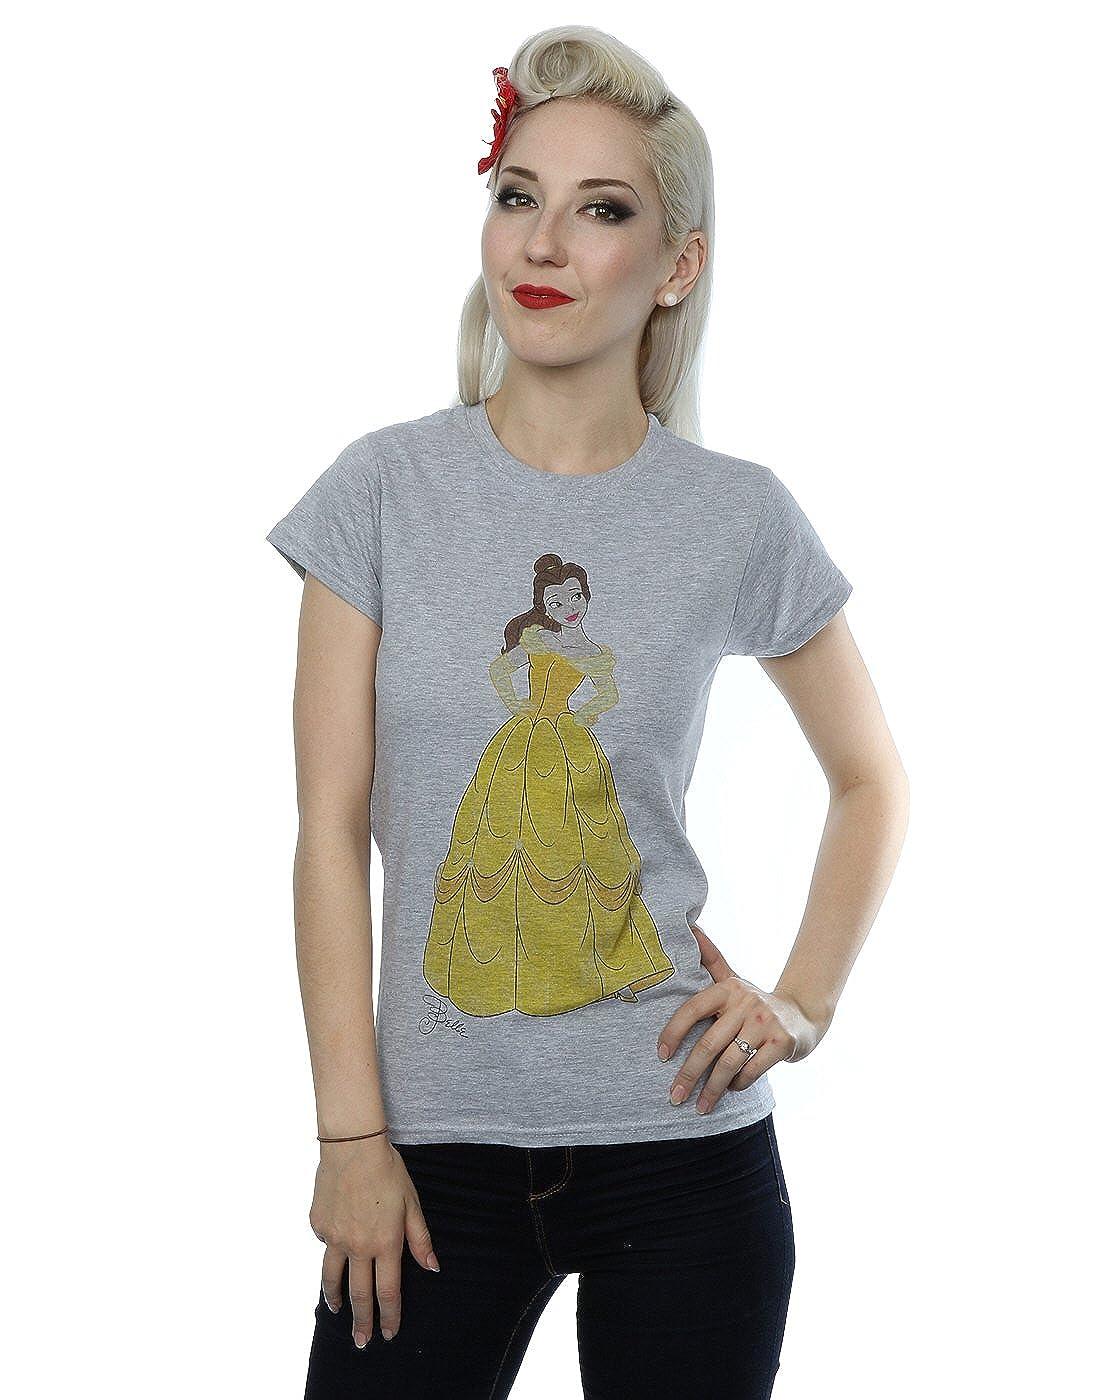 a732e2ede9e1c Amazon.com  Disney Women s Beauty and The Beast Classic Belle T-Shirt   Clothing